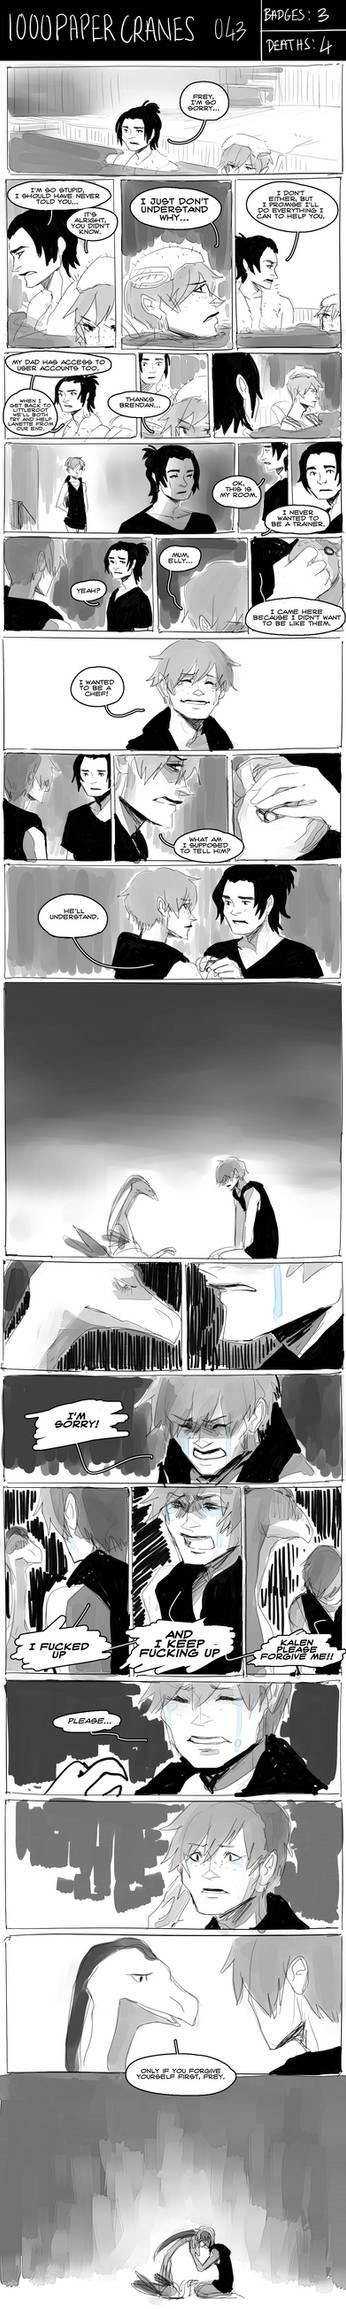 1000 Paper Cranes [EMERALD NUZLOCKE] 043